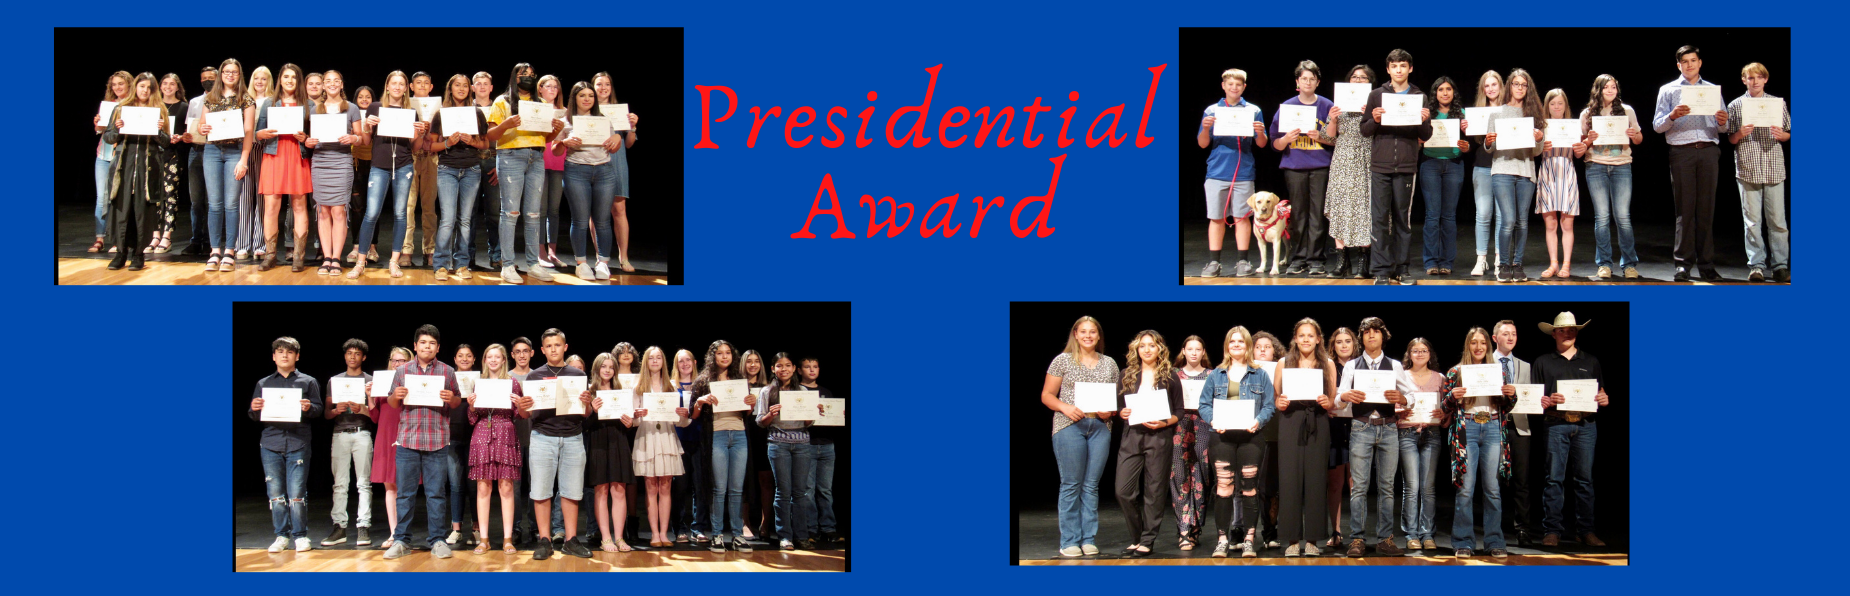 Presidential Award